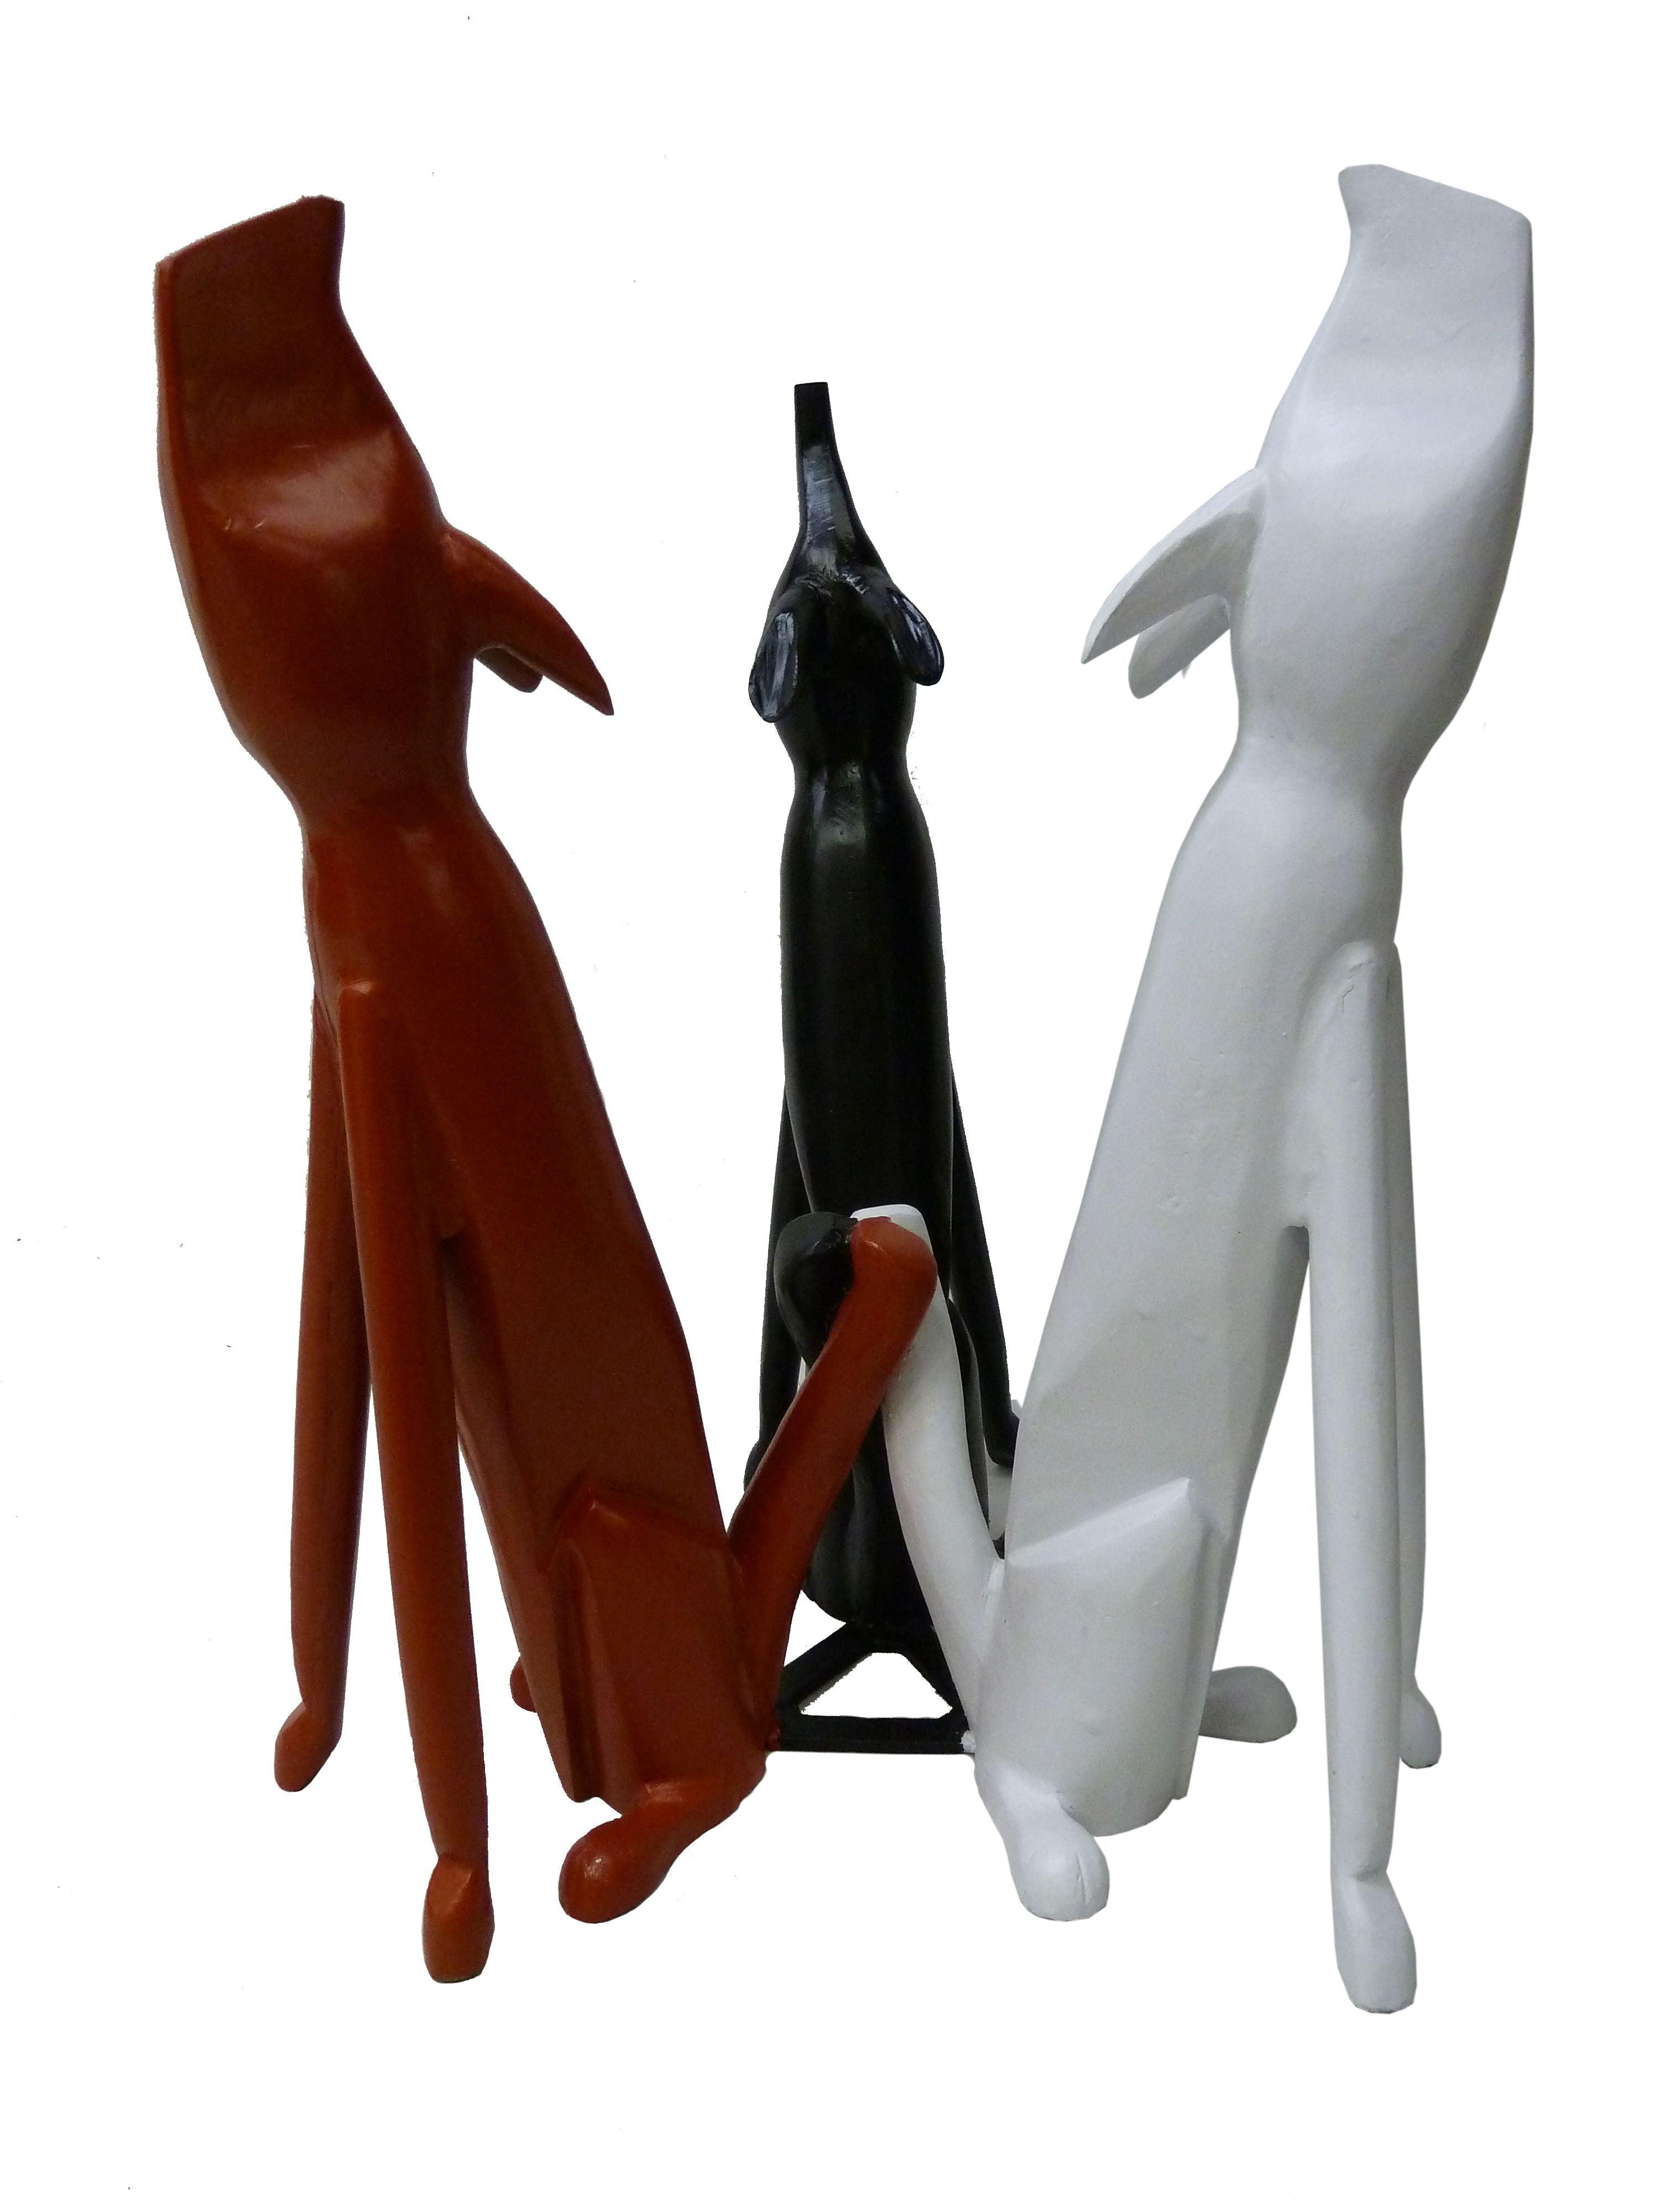 Monteverdi Young Dog Trio Base Table in Aluminum Chairish : fc5b05bd 2bfb 4c34 99cc cb7047334e00aspectfitampwidth640ampheight640 from www.chairish.com size 640 x 640 jpeg 25kB